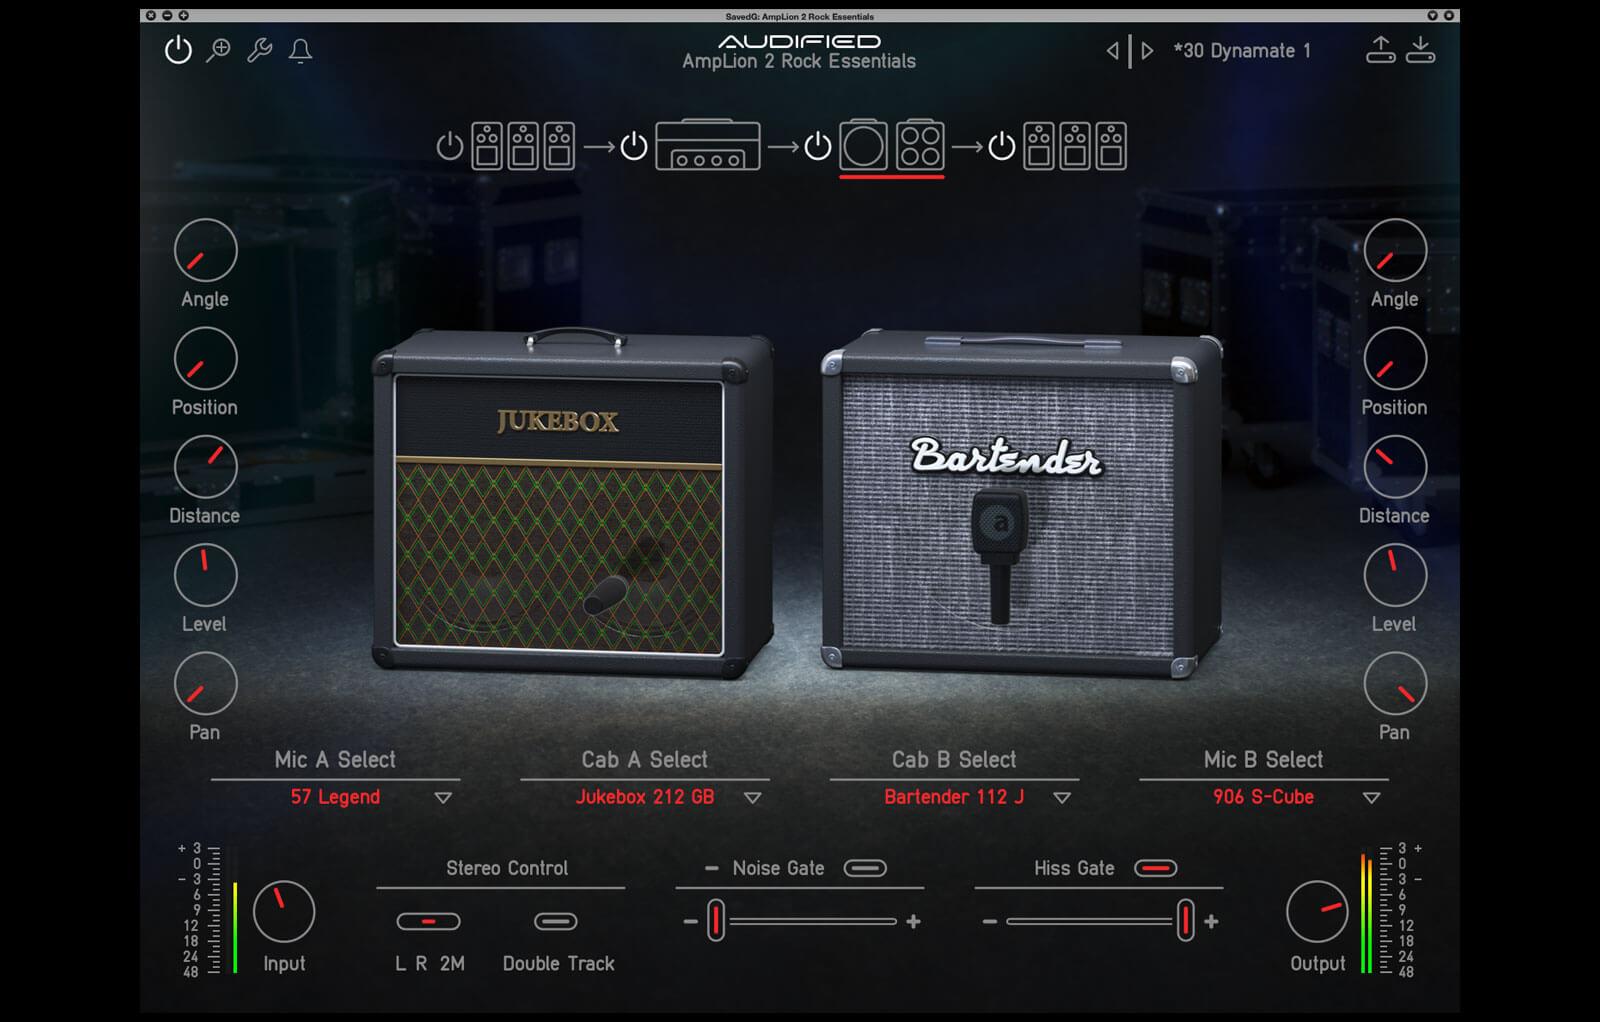 AmpLion 2 Rock Essentials